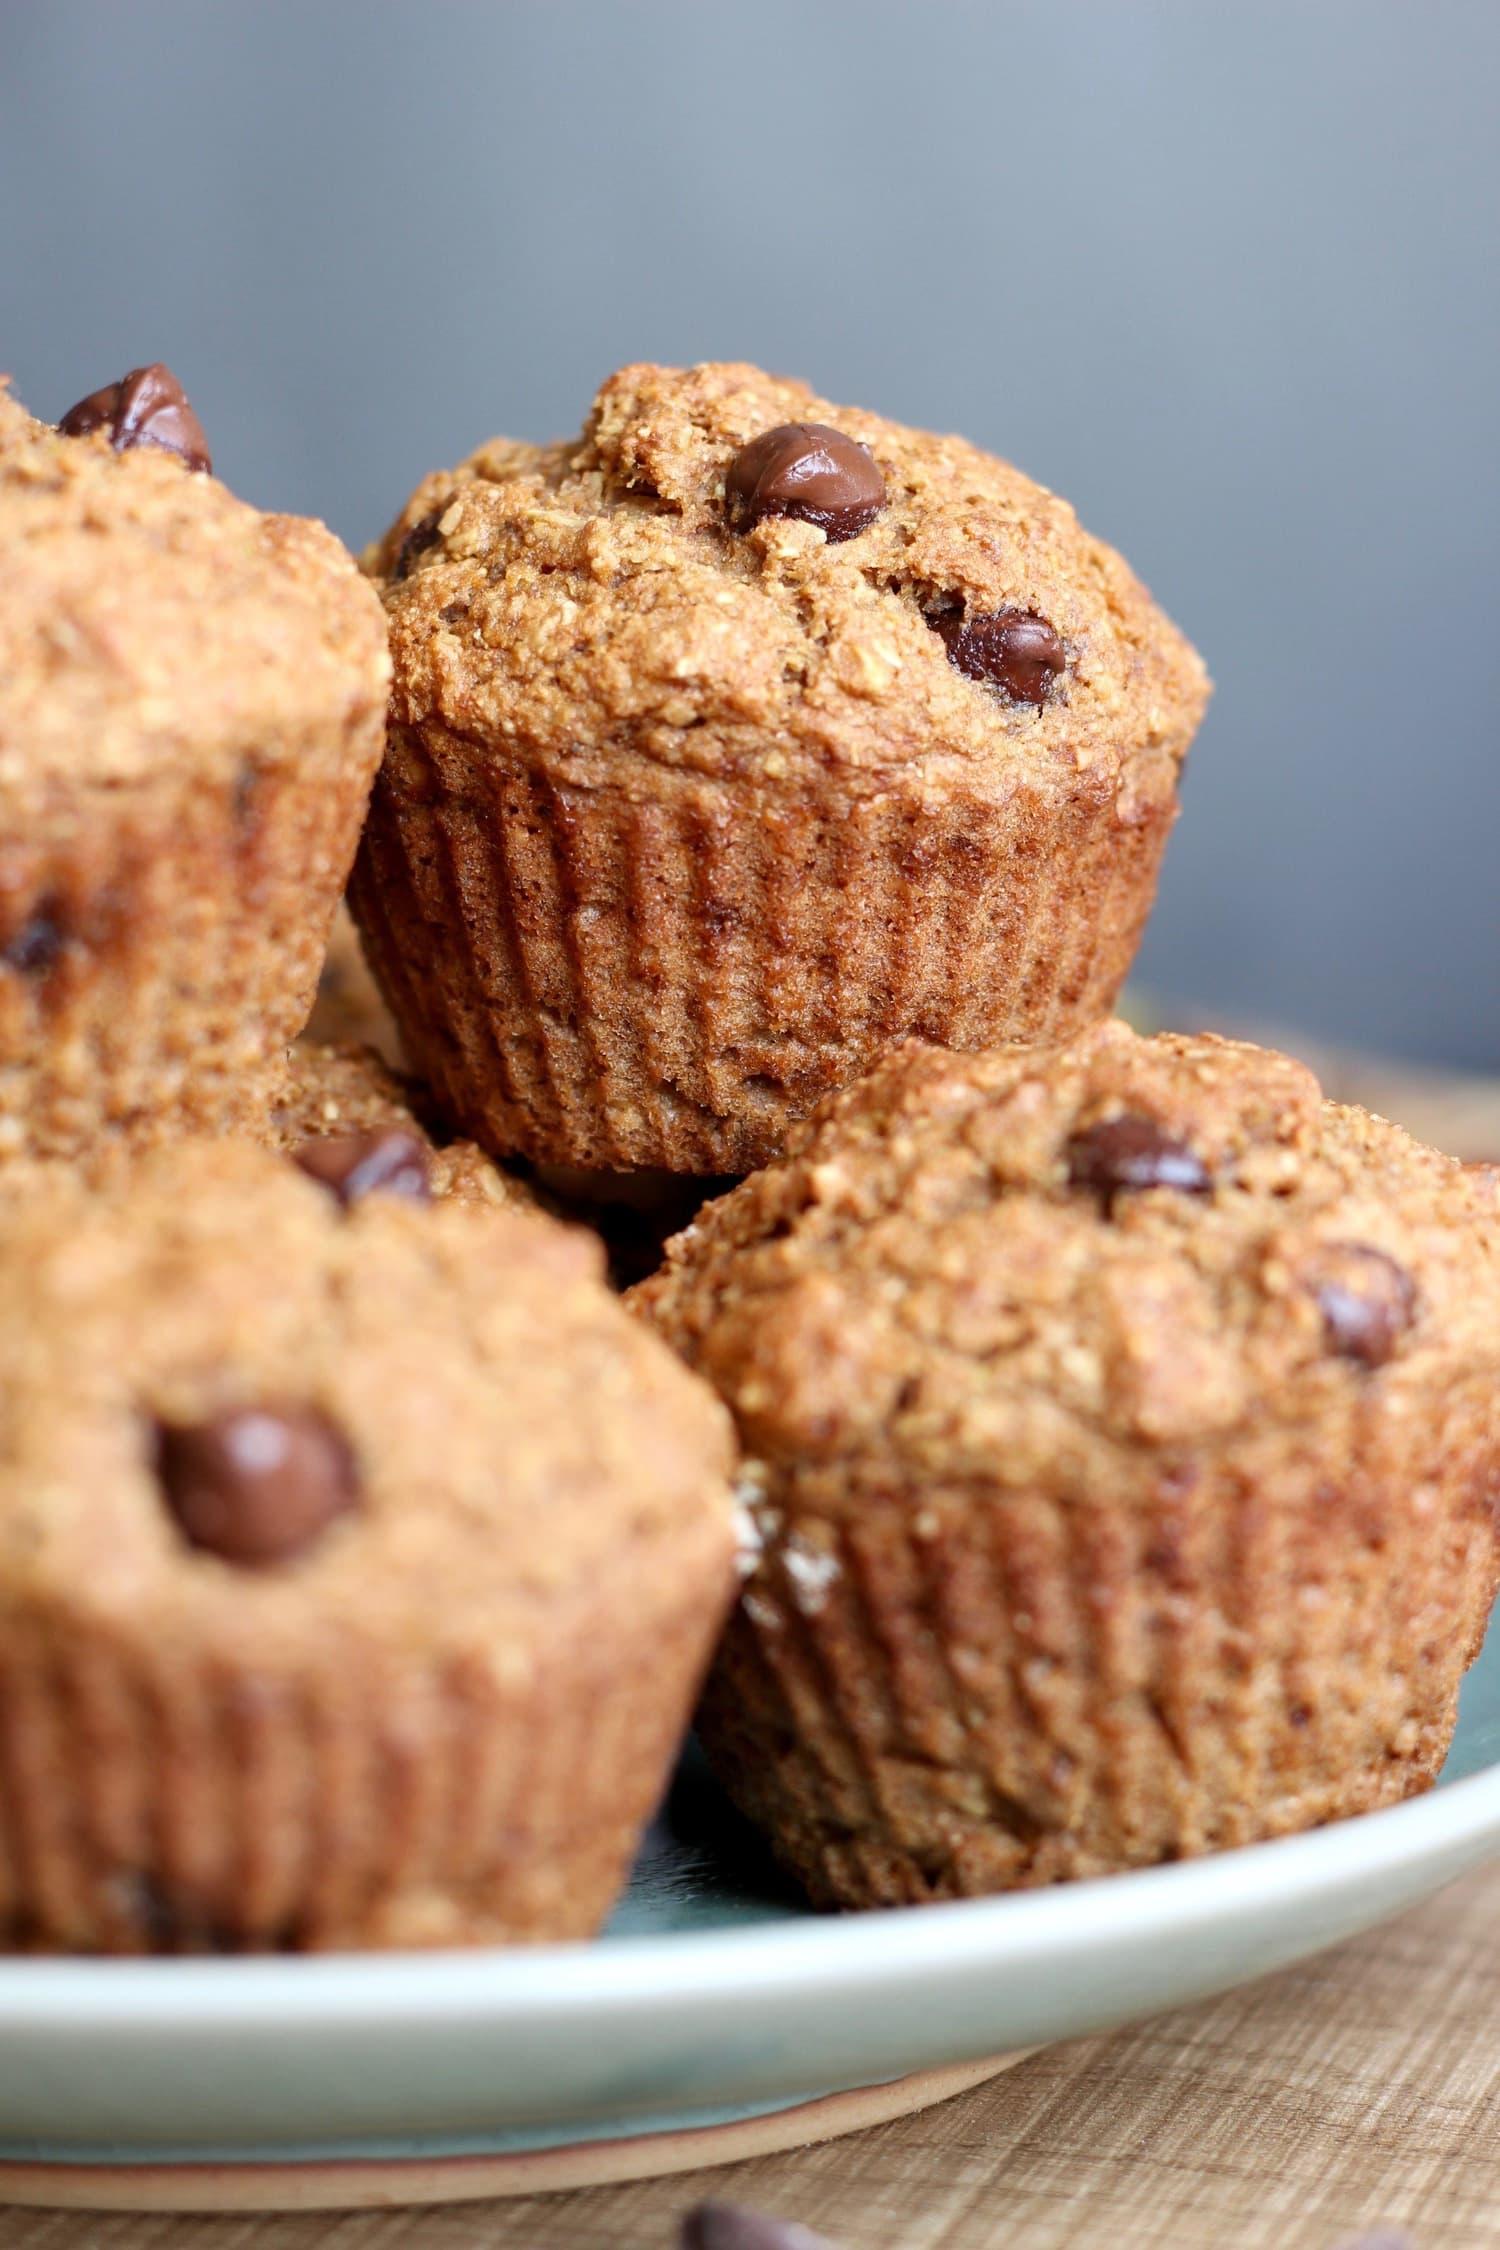 Recipe for eggless oat bran muffins